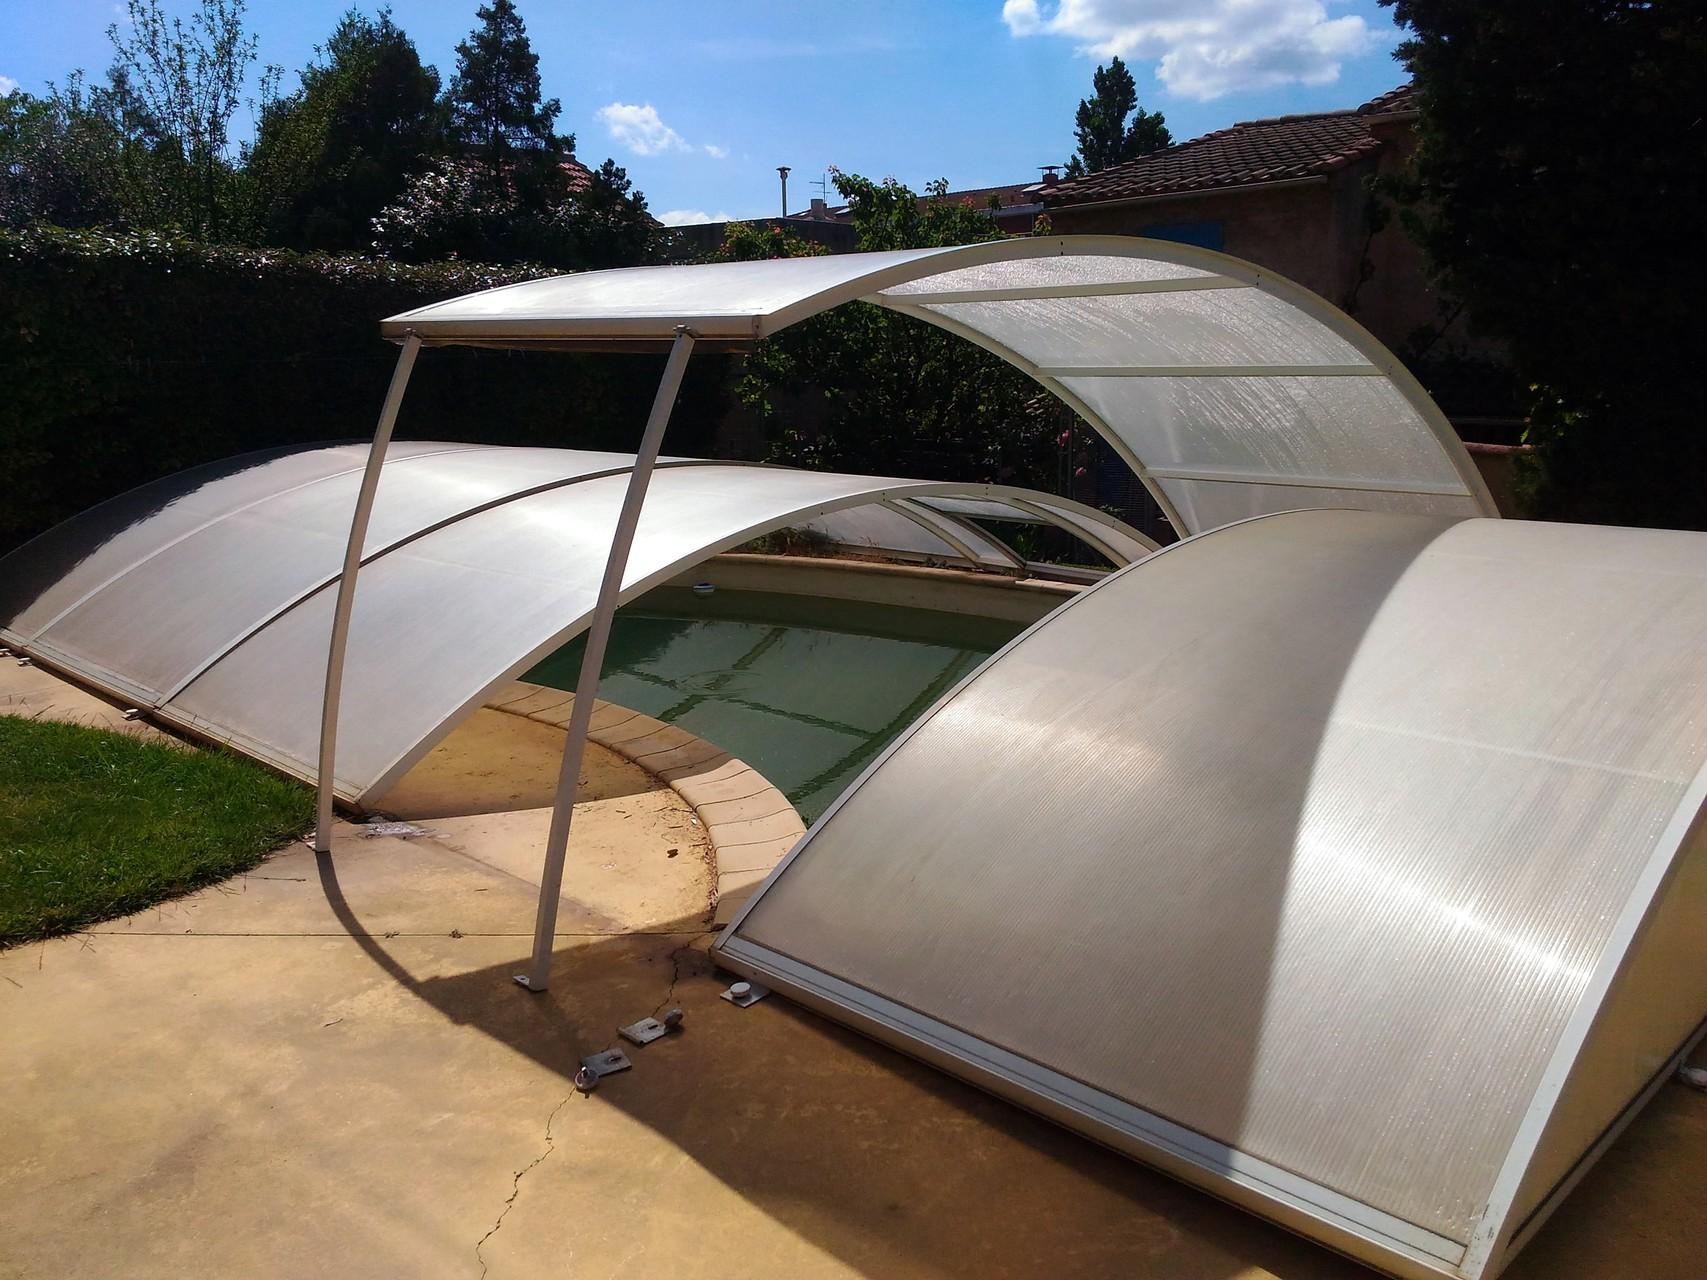 elegant abri piscine marque abrisud with abrisud bordeaux. Black Bedroom Furniture Sets. Home Design Ideas